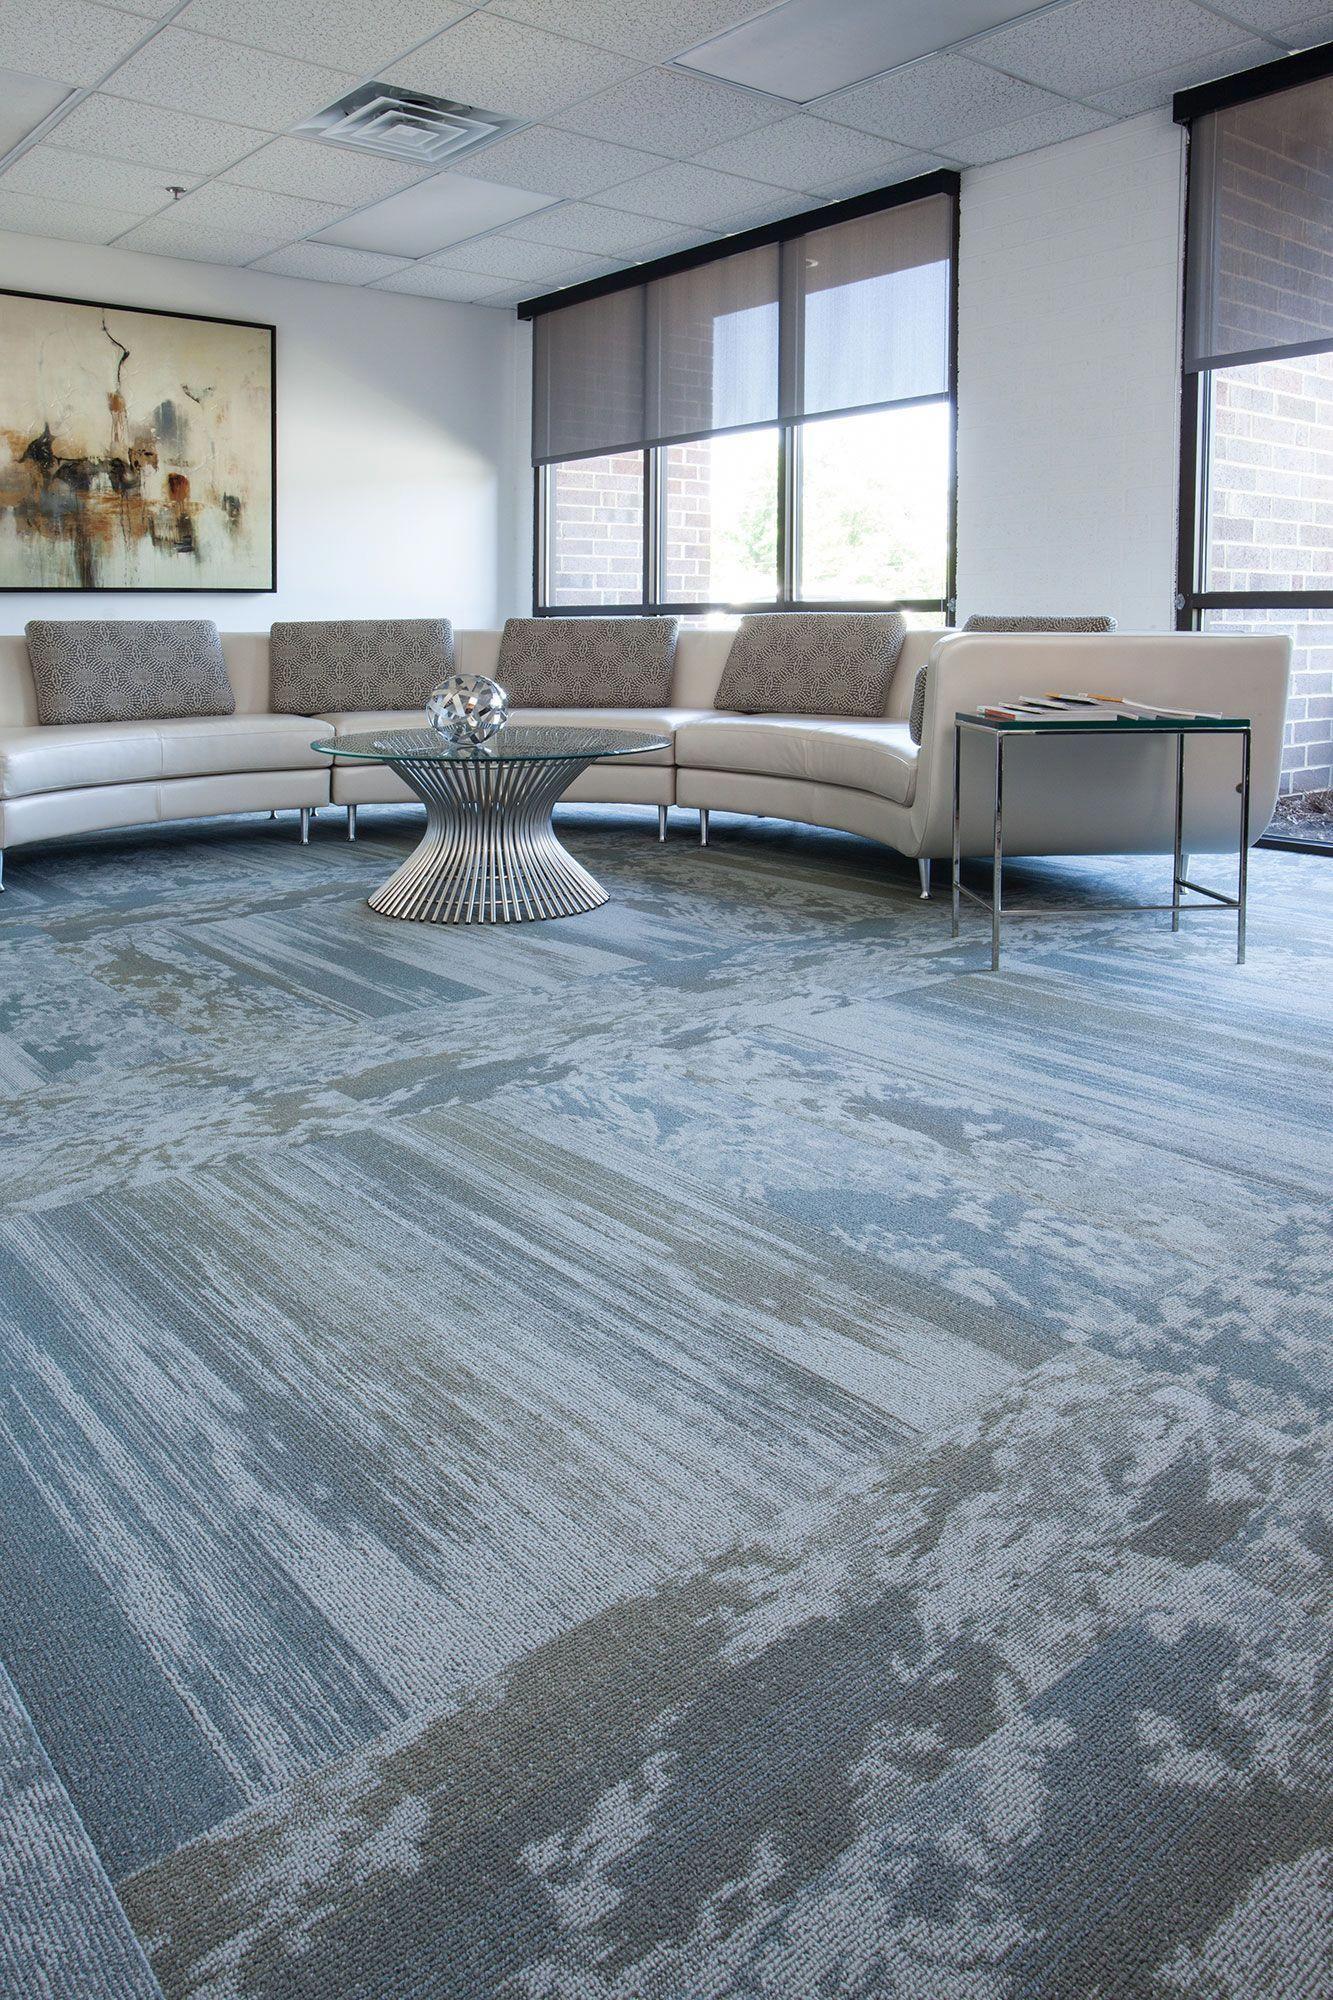 Carpet Runner Installation Guide Carpetrunnersmississauga Product Id 7448639623 Textured Carpet Carpet Stores Carpet Flooring